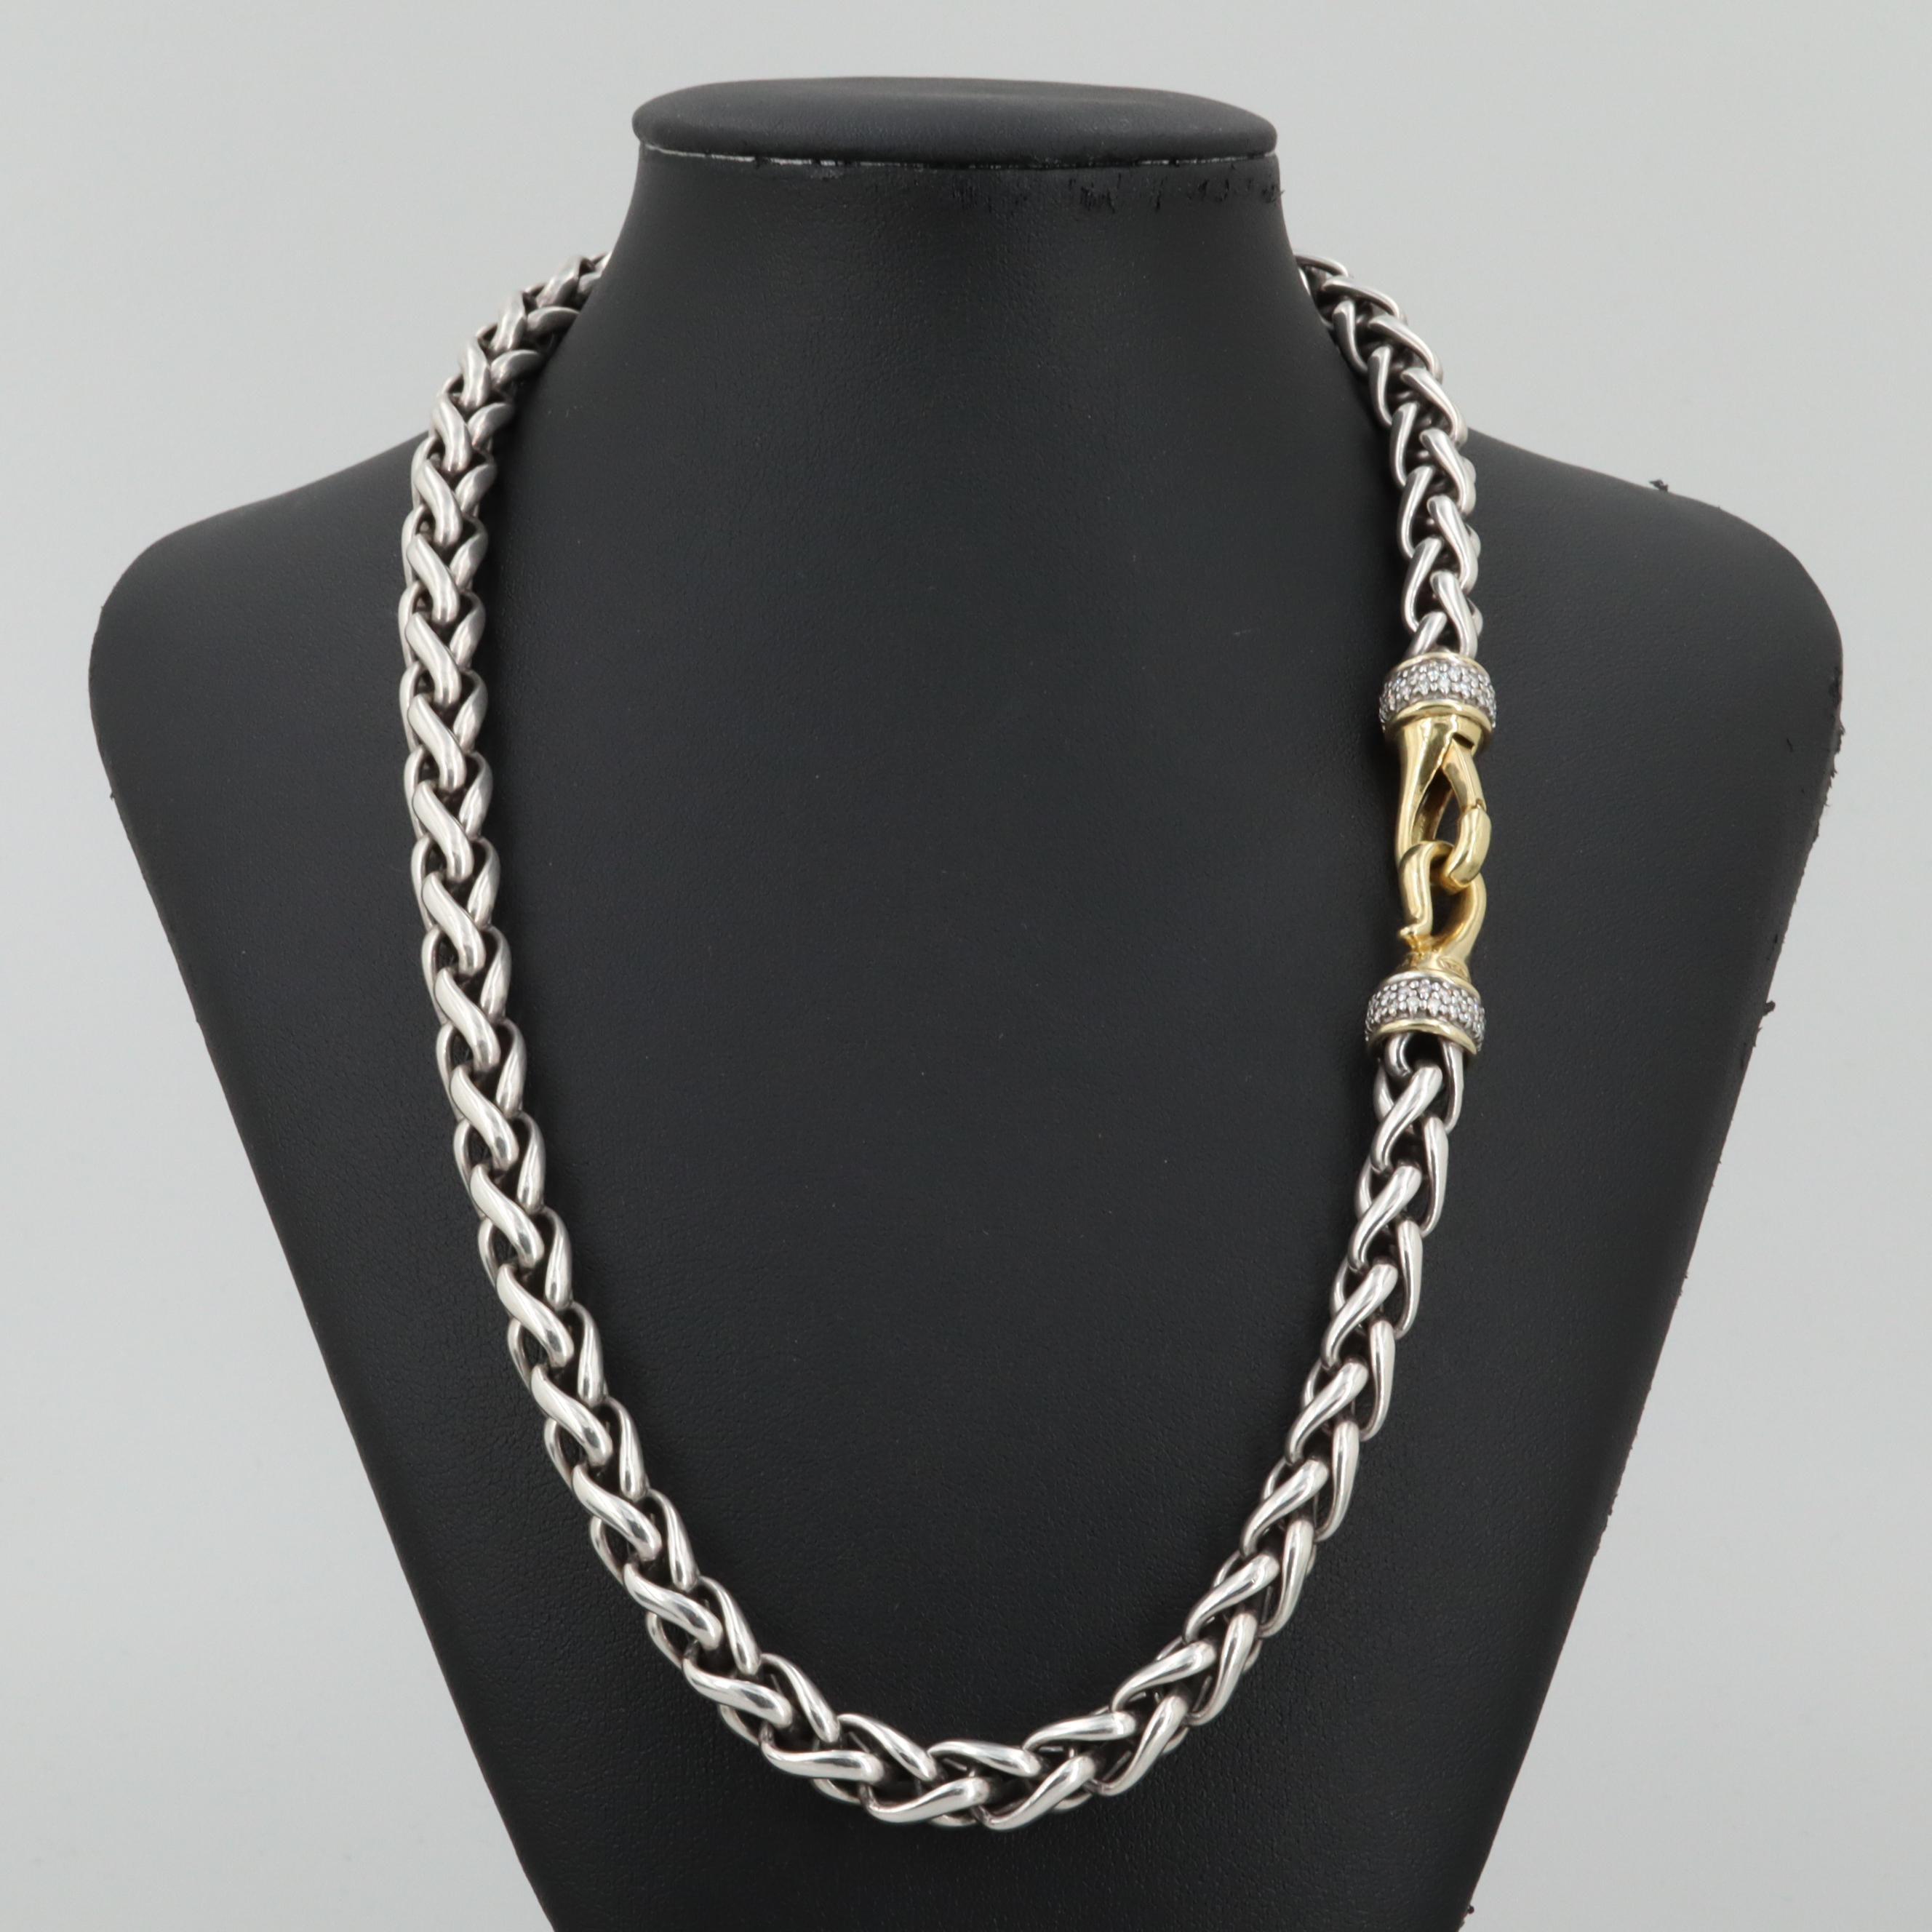 David Yurman Sterling and 18K Yellow Gold Diamonds Necklace